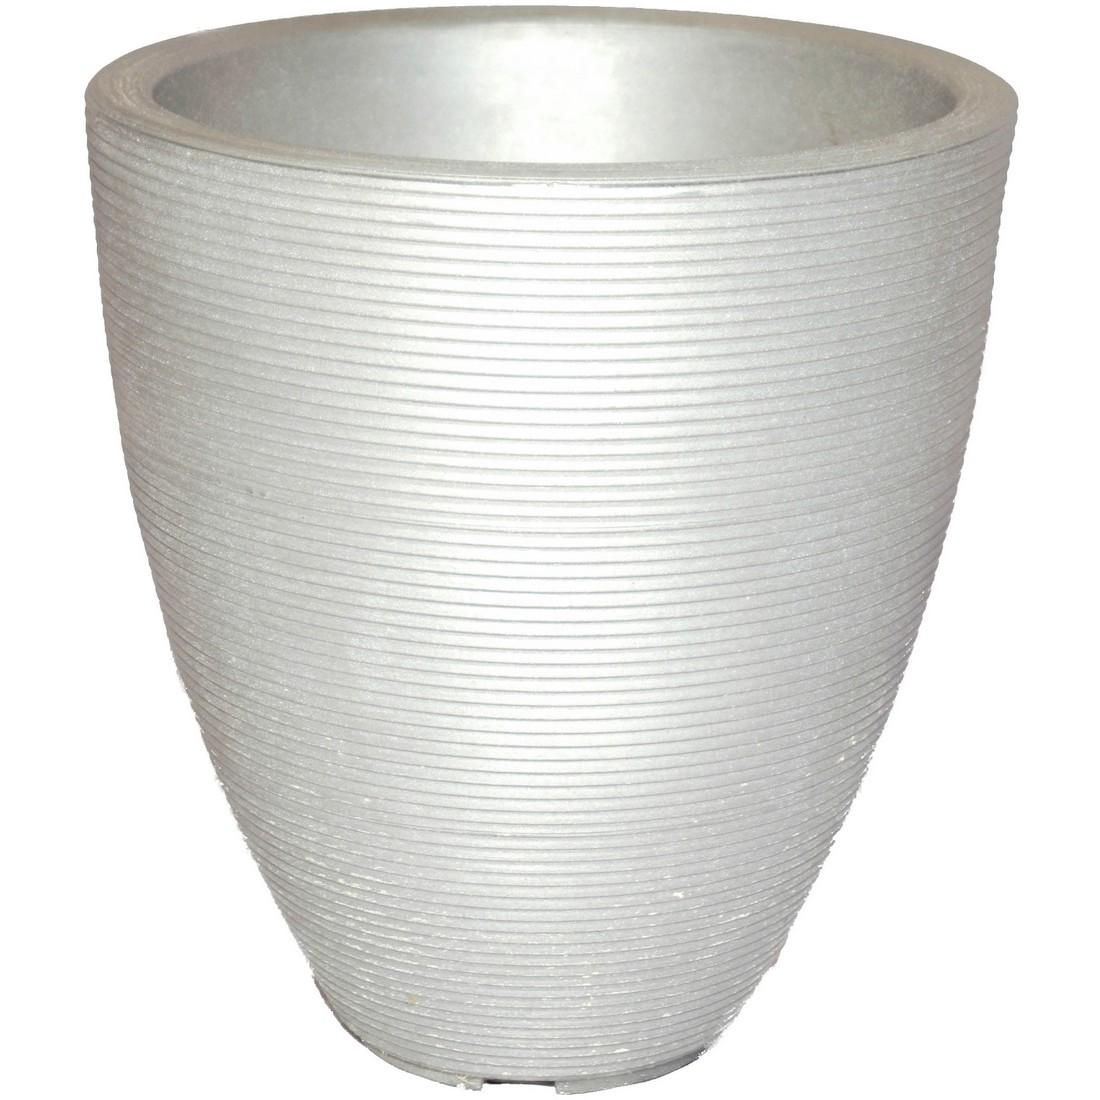 Pflanzkübel Pewter – Kunststoff – Delano, Cresent Garden bestellen